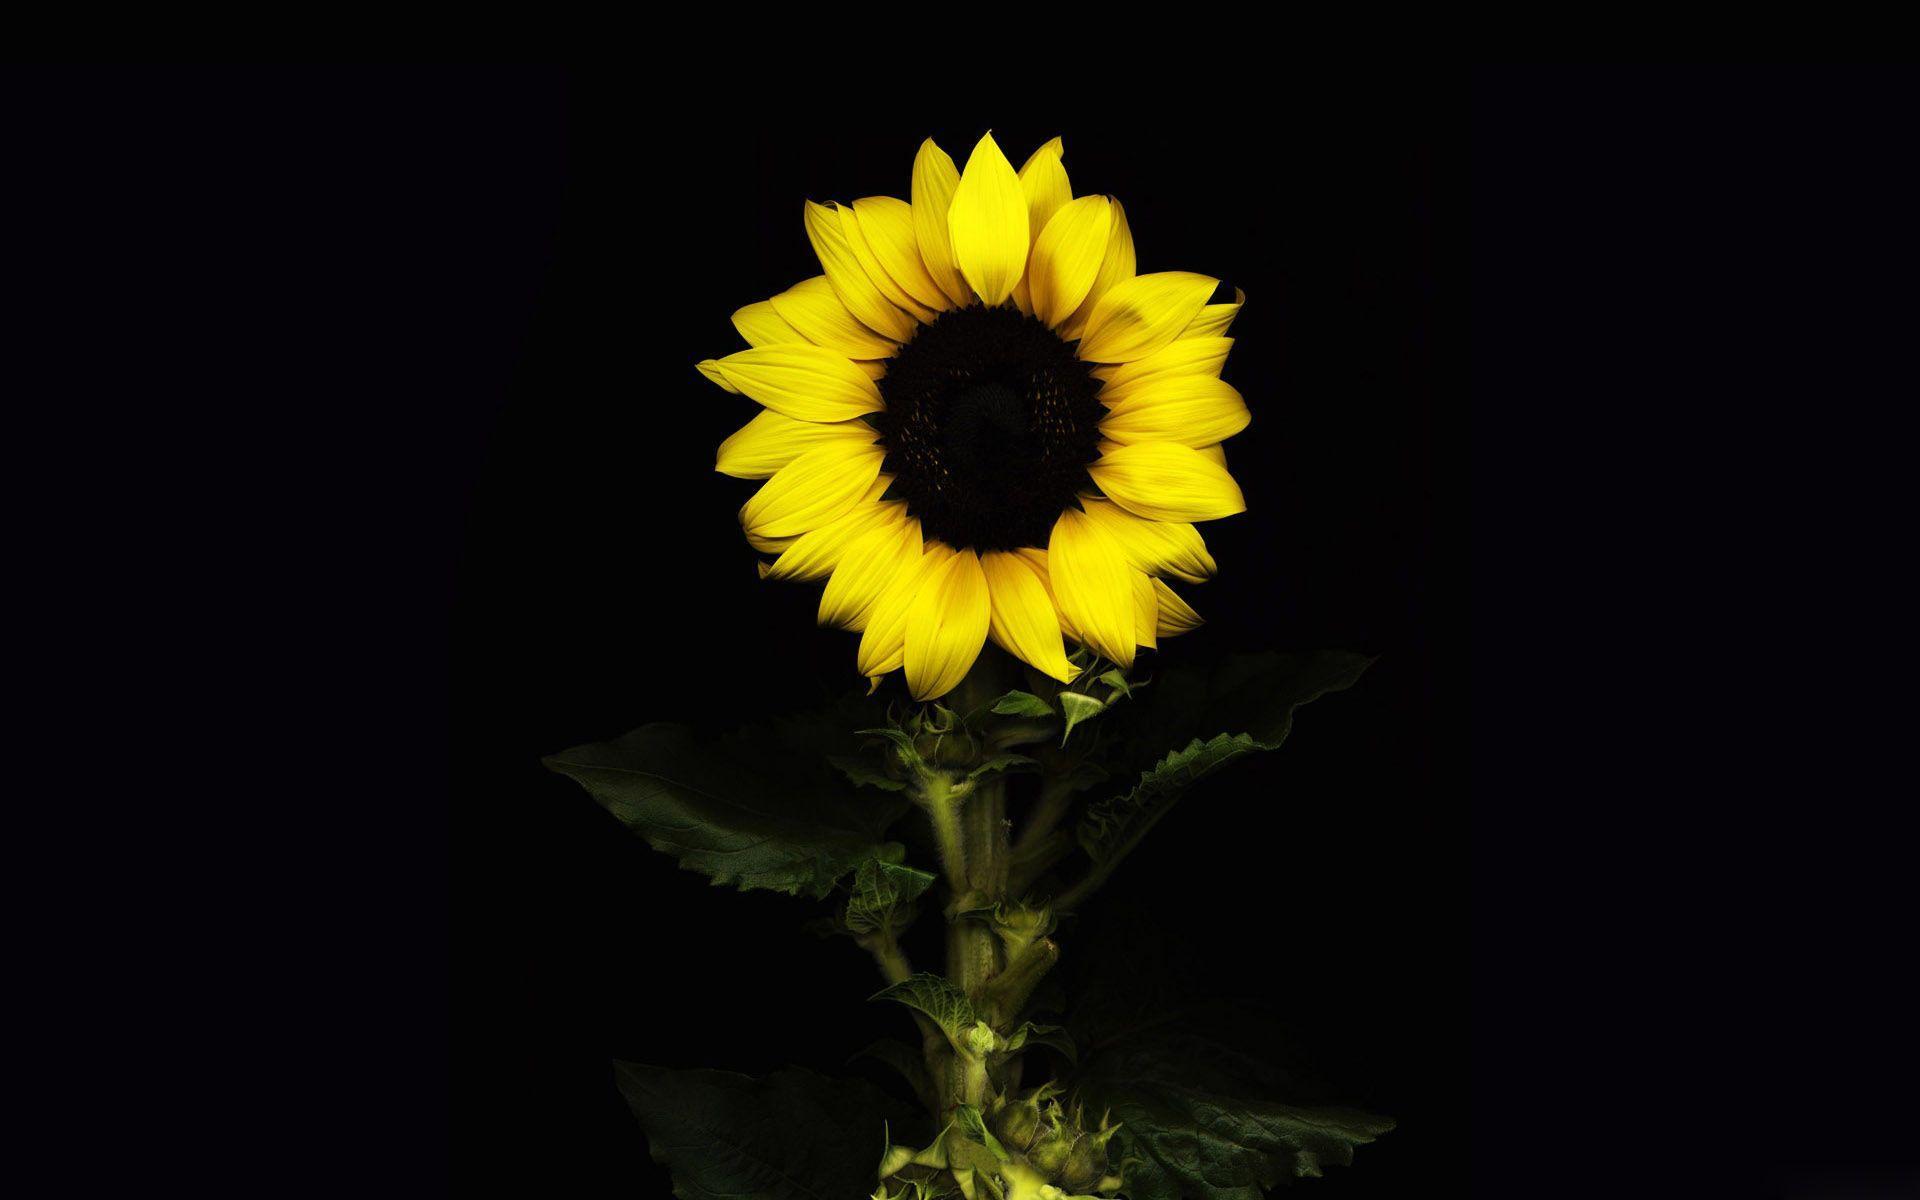 sunflower 8 wallpaper 1920x1080 - photo #20